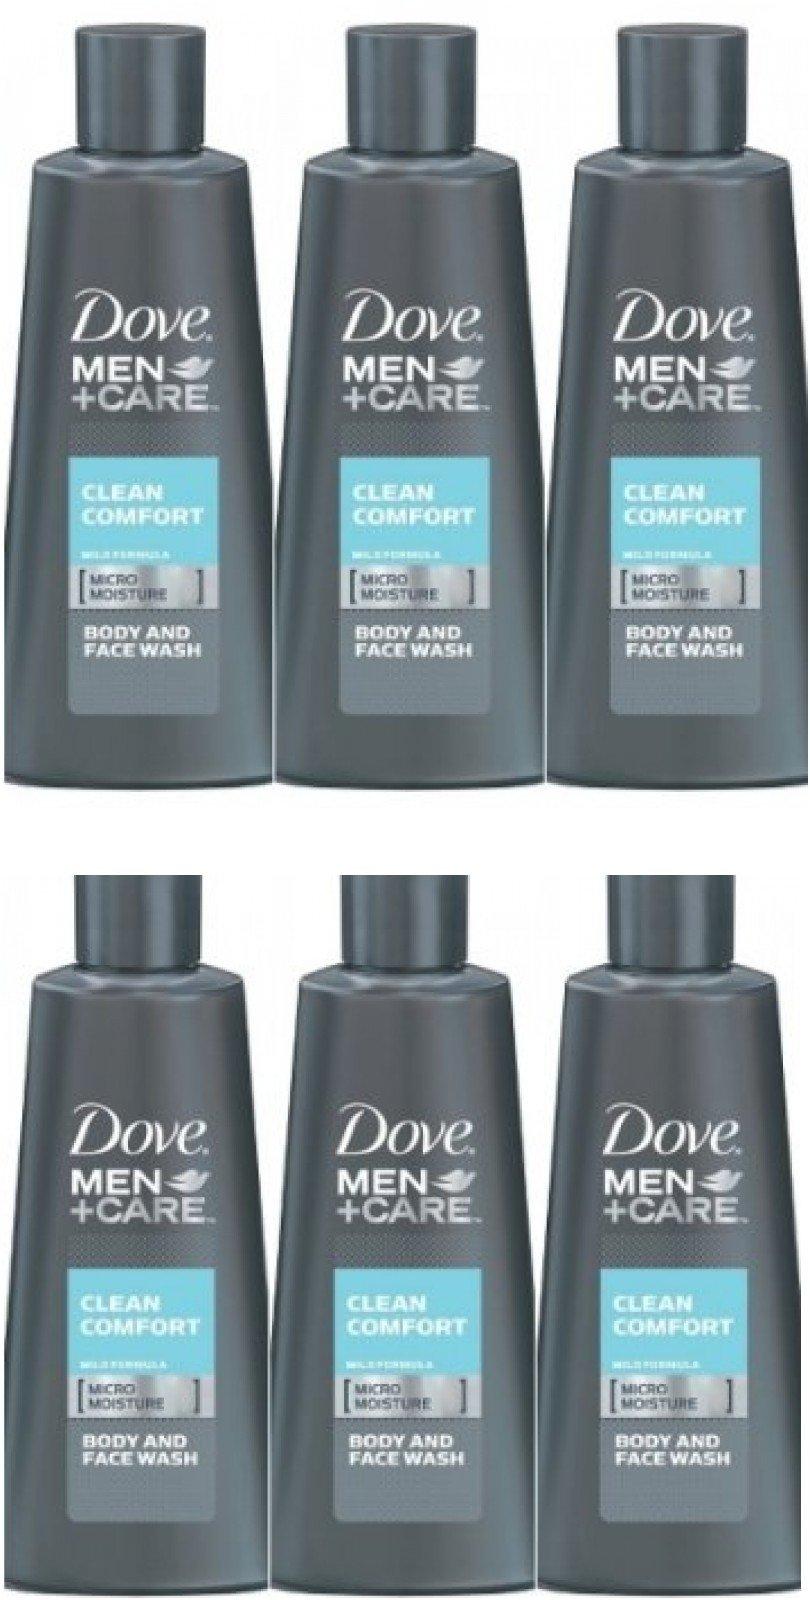 Dove Mens Care Clean Comfort Micro Moisture Body Wash Travel Size 3 Ounce 6 Pk